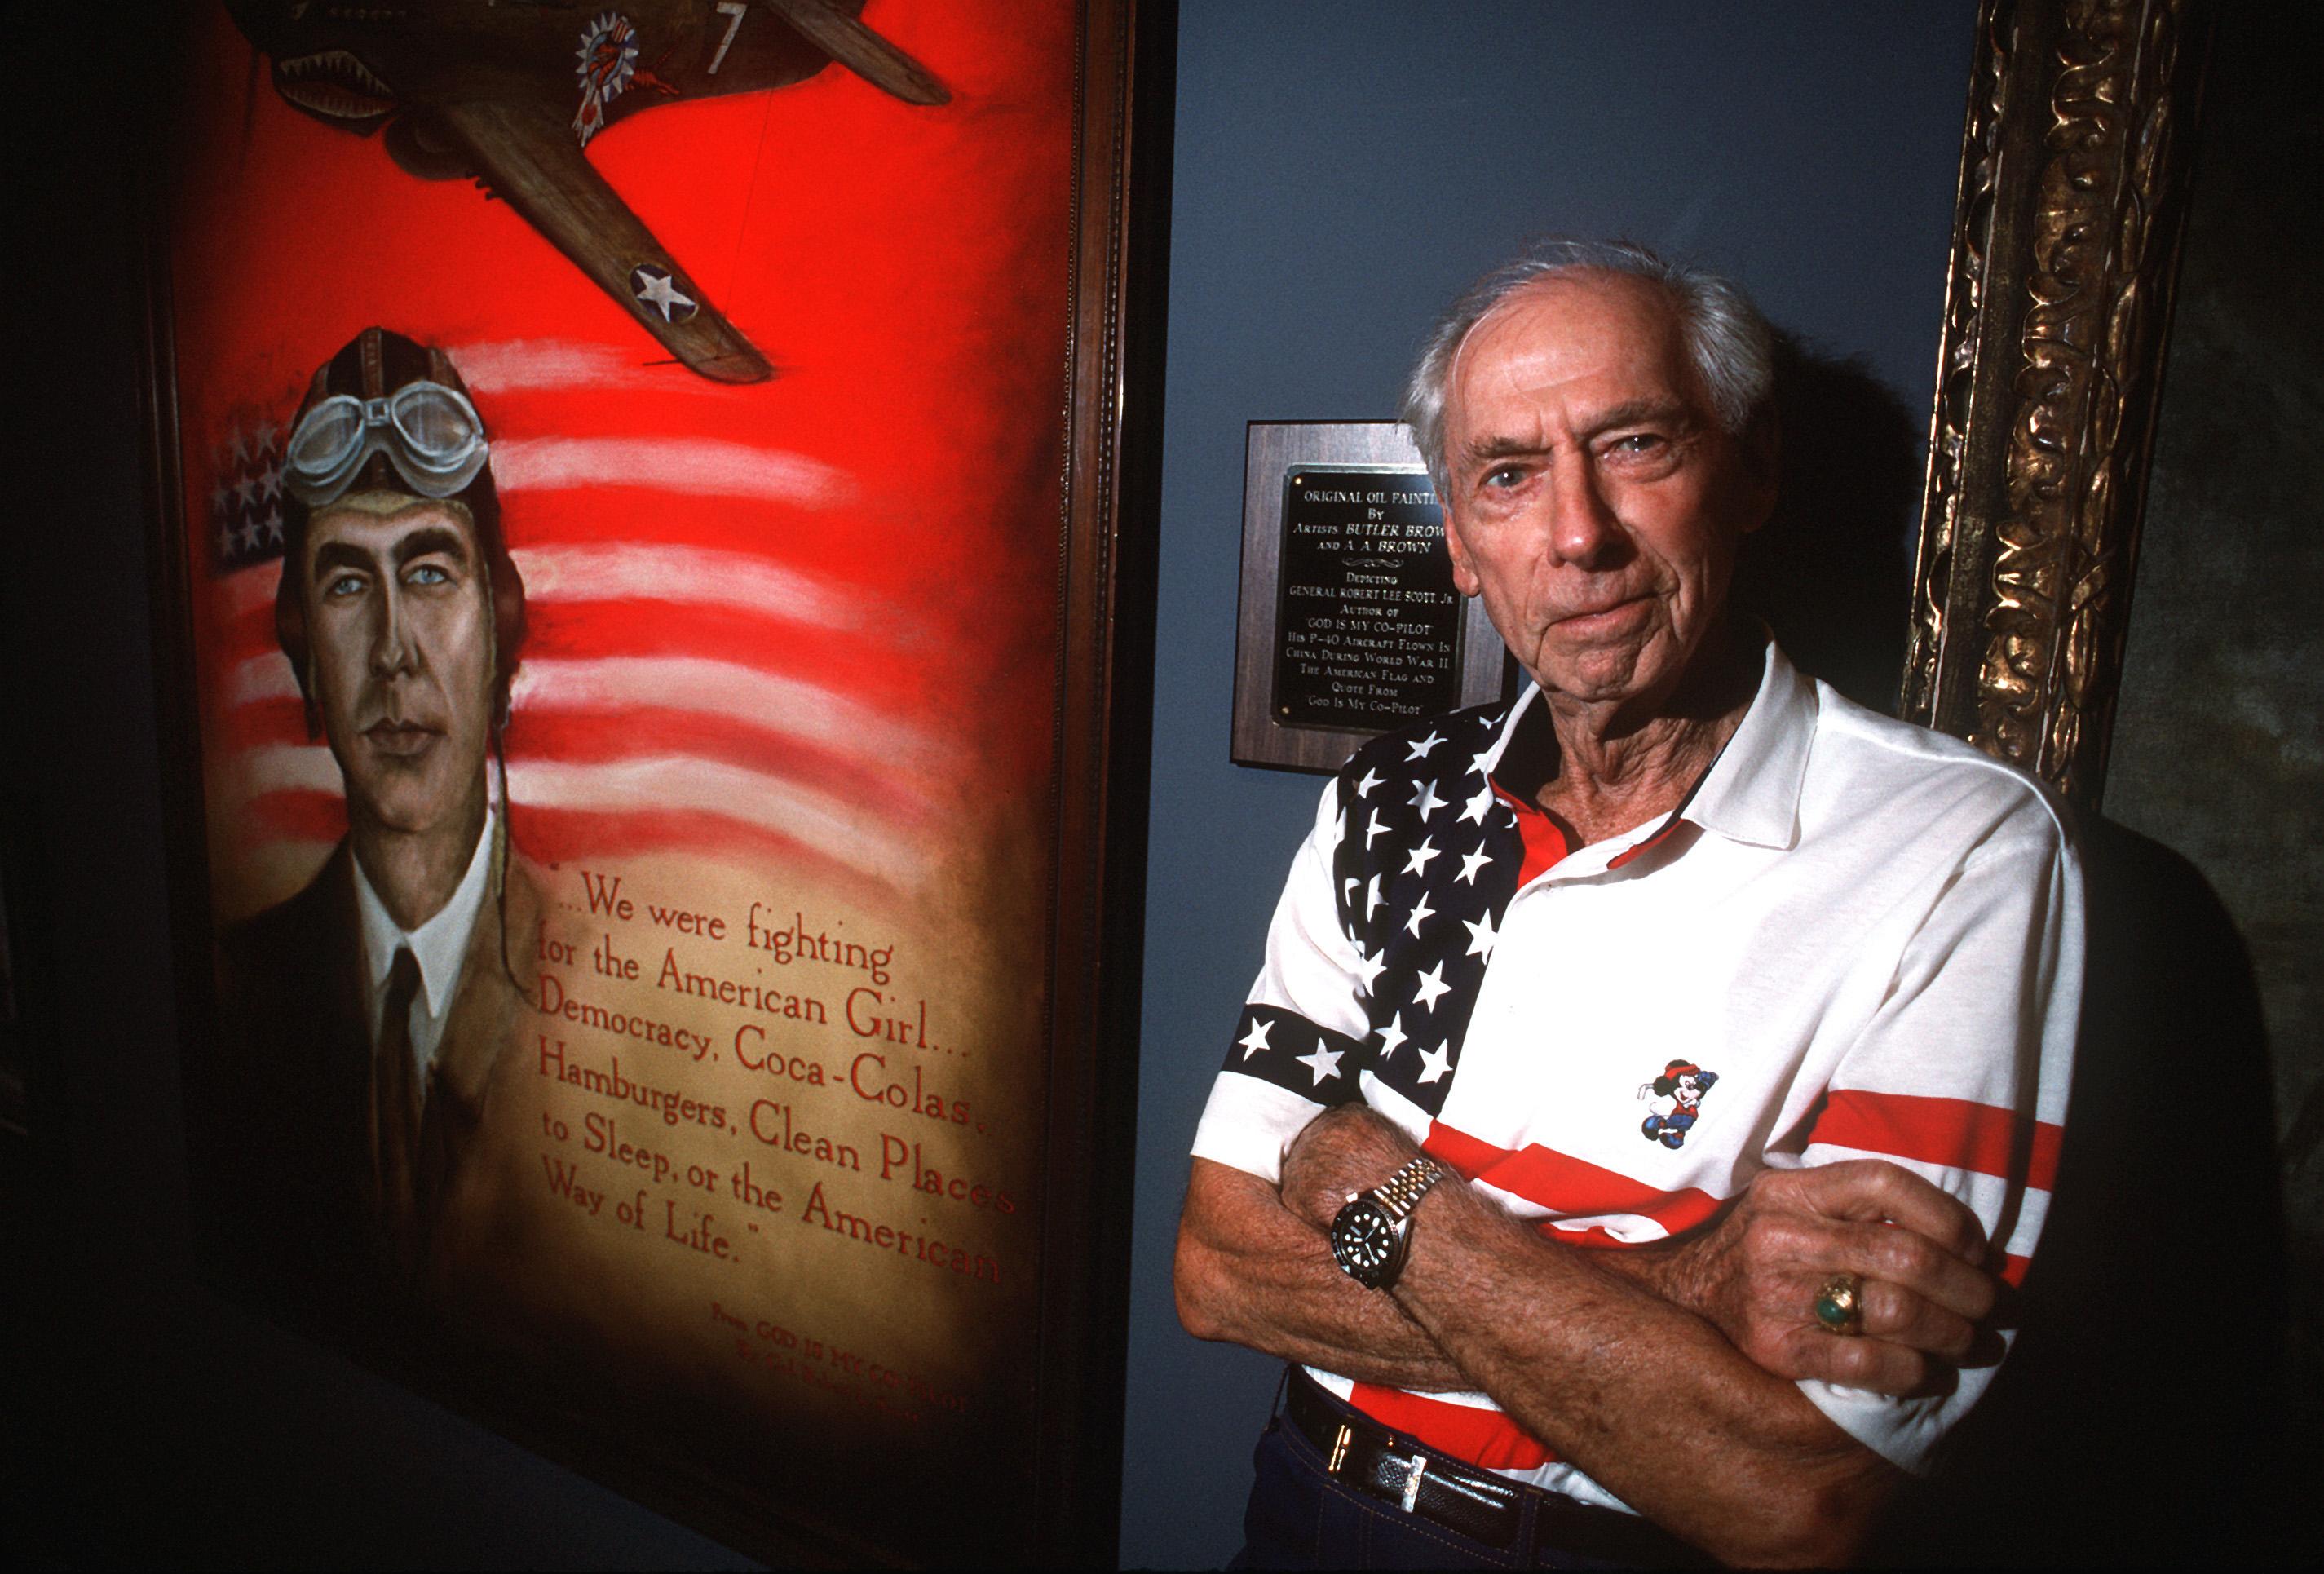 Retired Gen. Robert Lee Scott, Jr. pictured next to an original oil painting of himself.